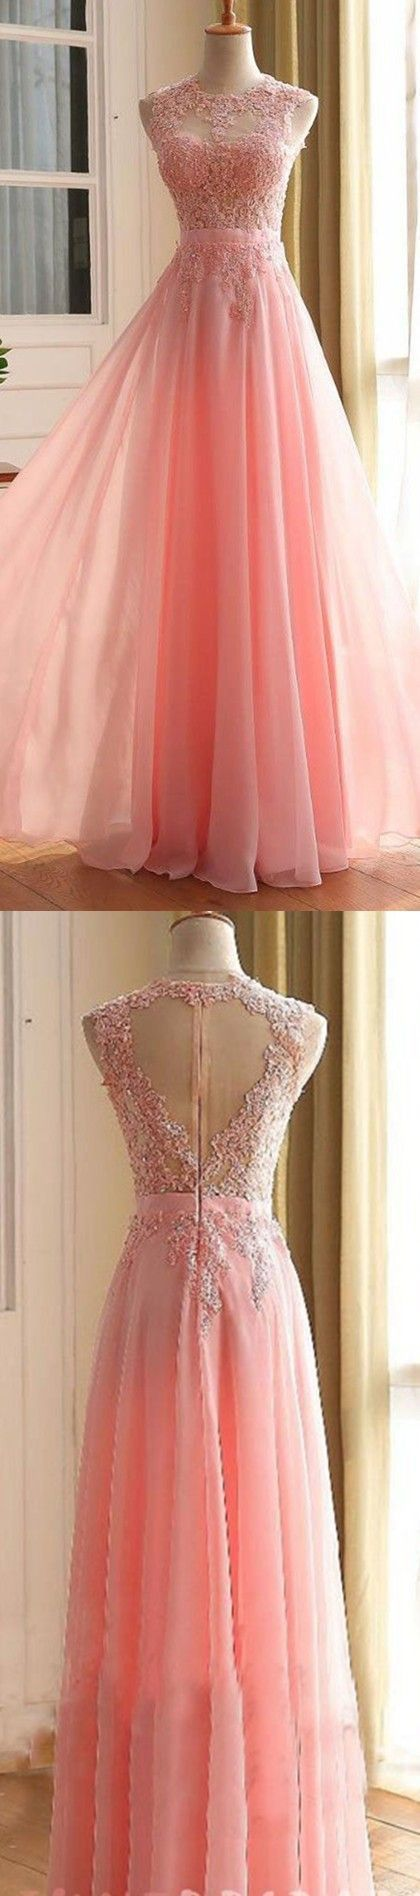 Charming long prom dress appliques pink prom dresselegant prom